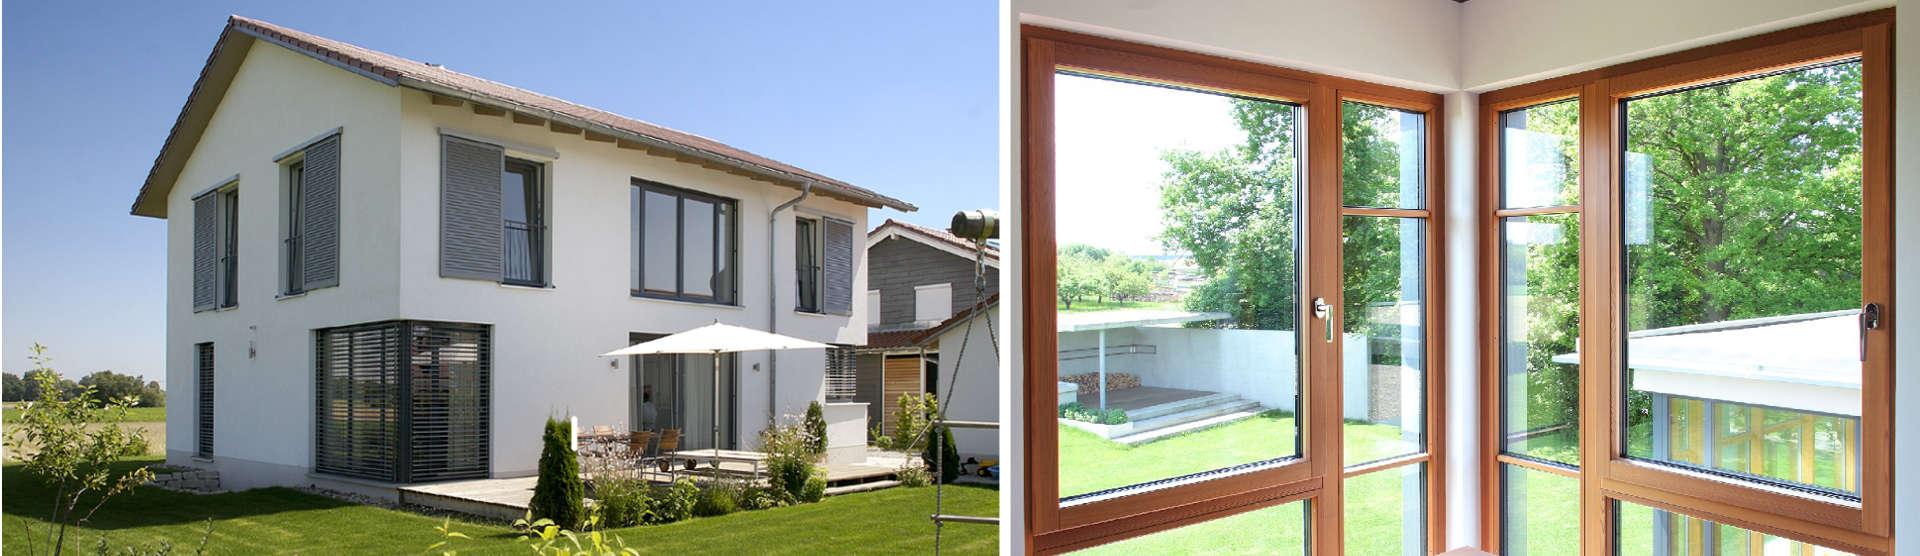 Holz-Aluminiumfenster_1